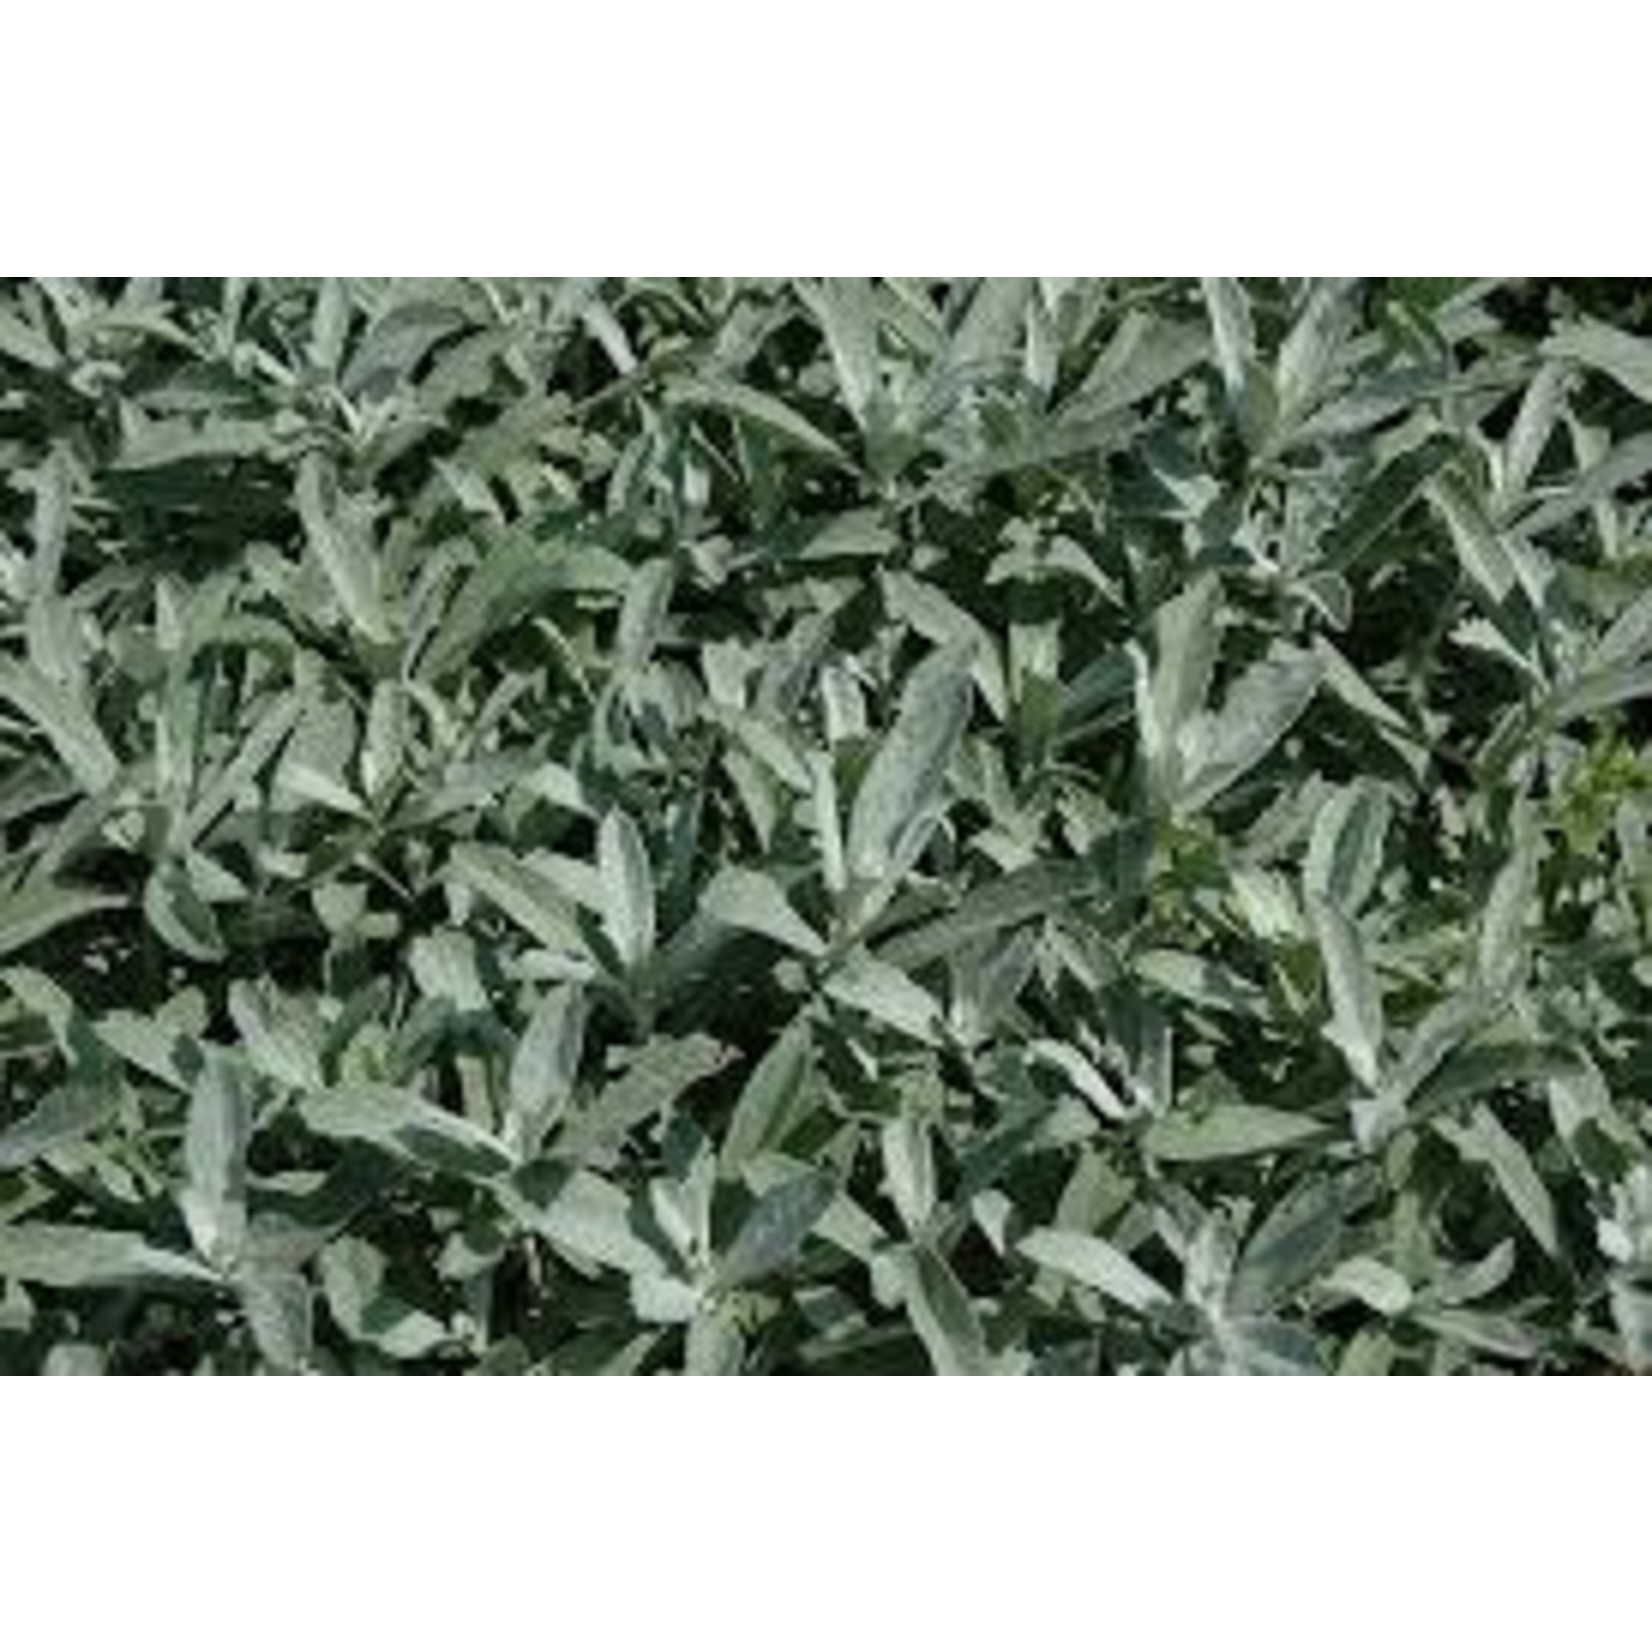 "4"" Perennial\ Artemisia Silver King"